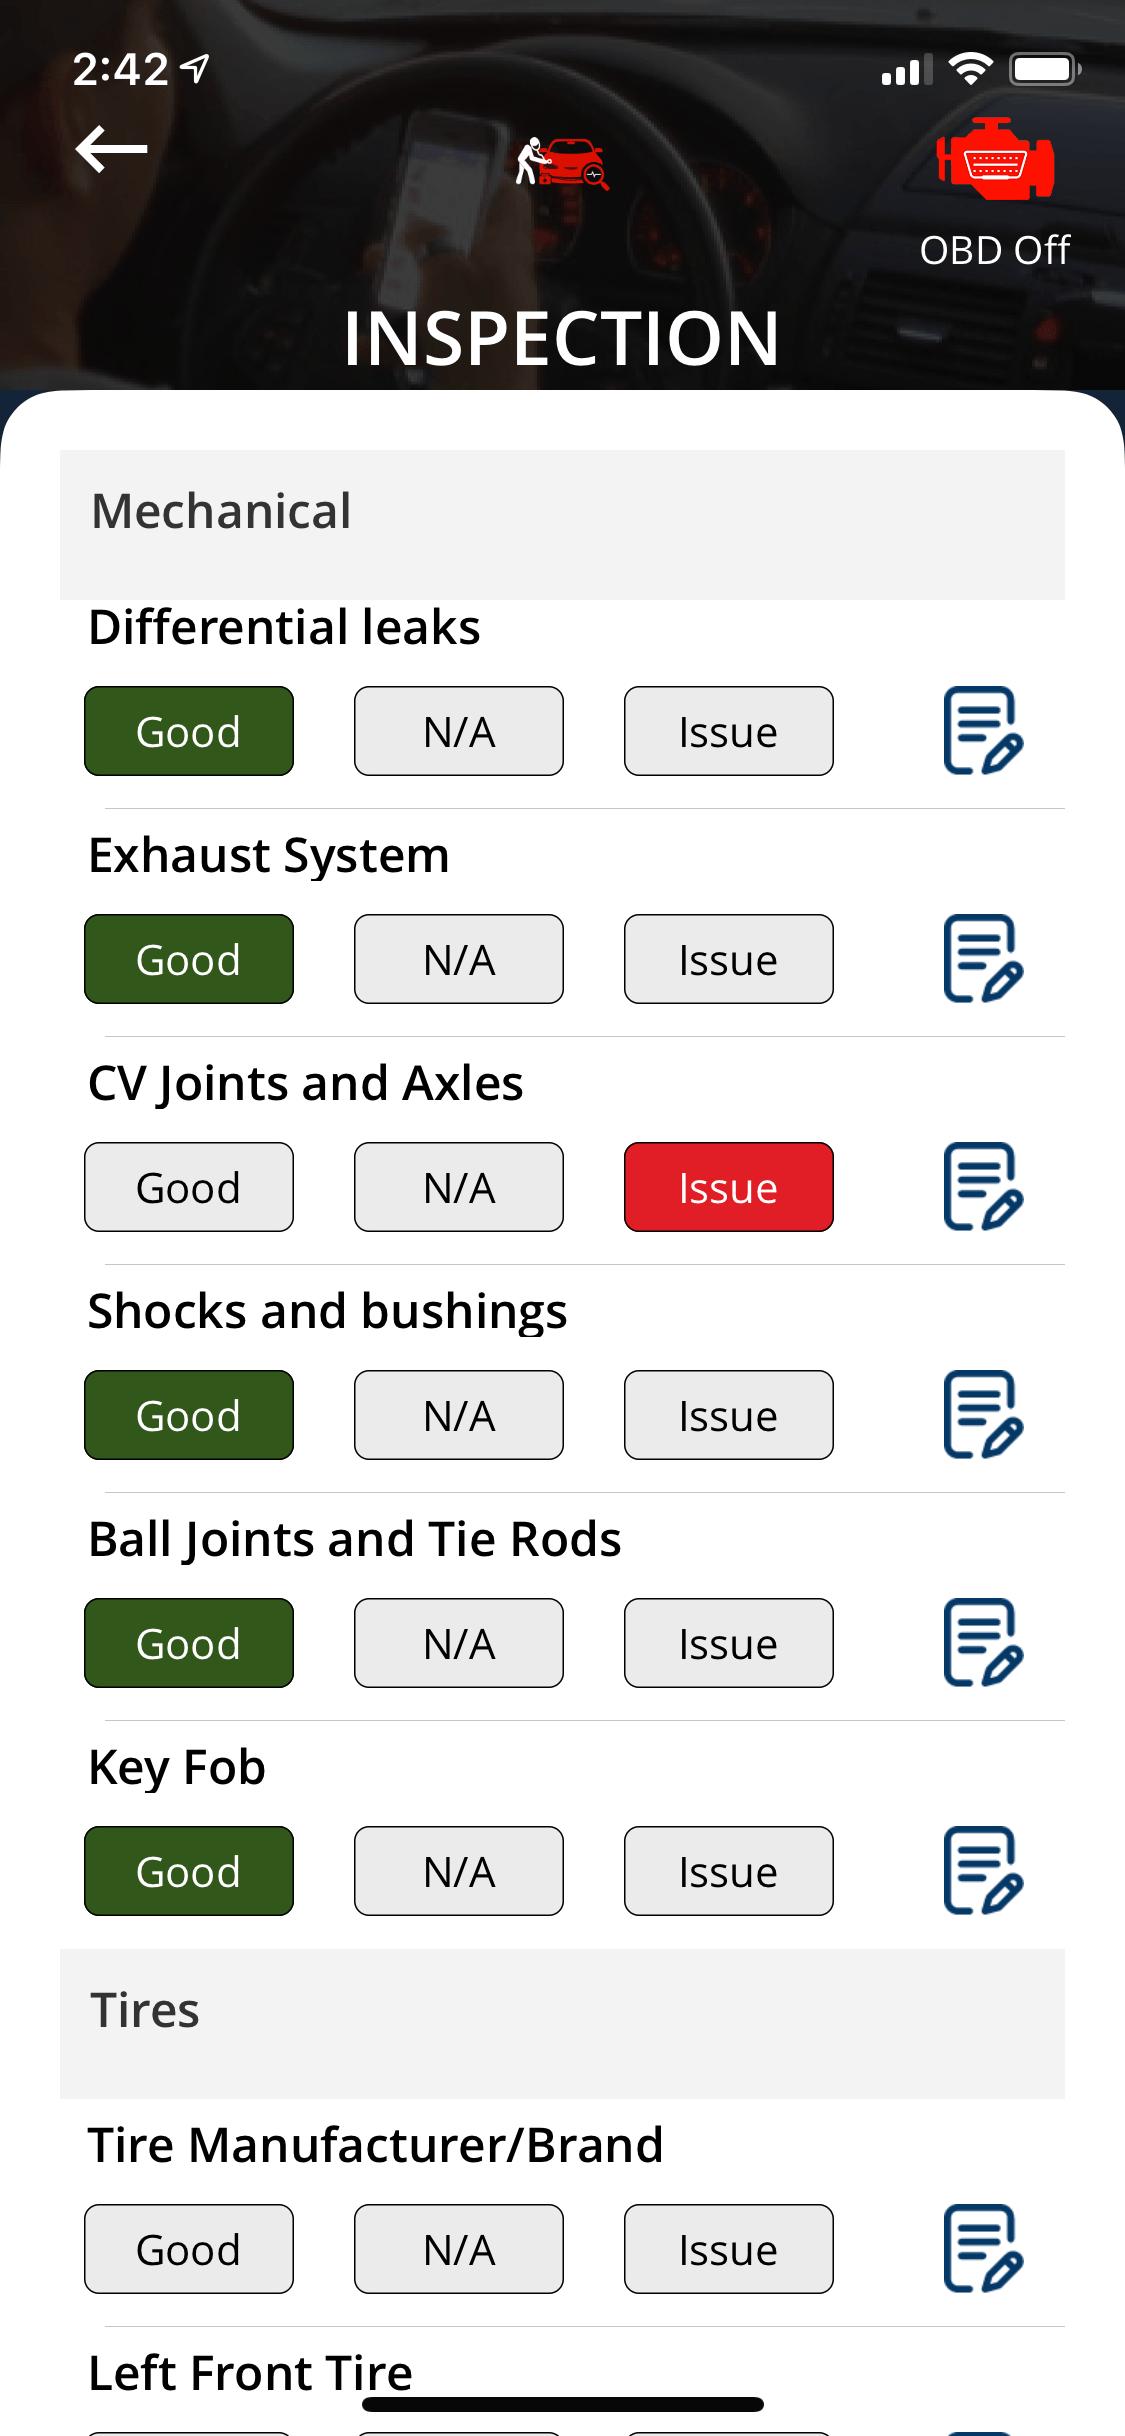 Inspection App - Mechanical Inspection